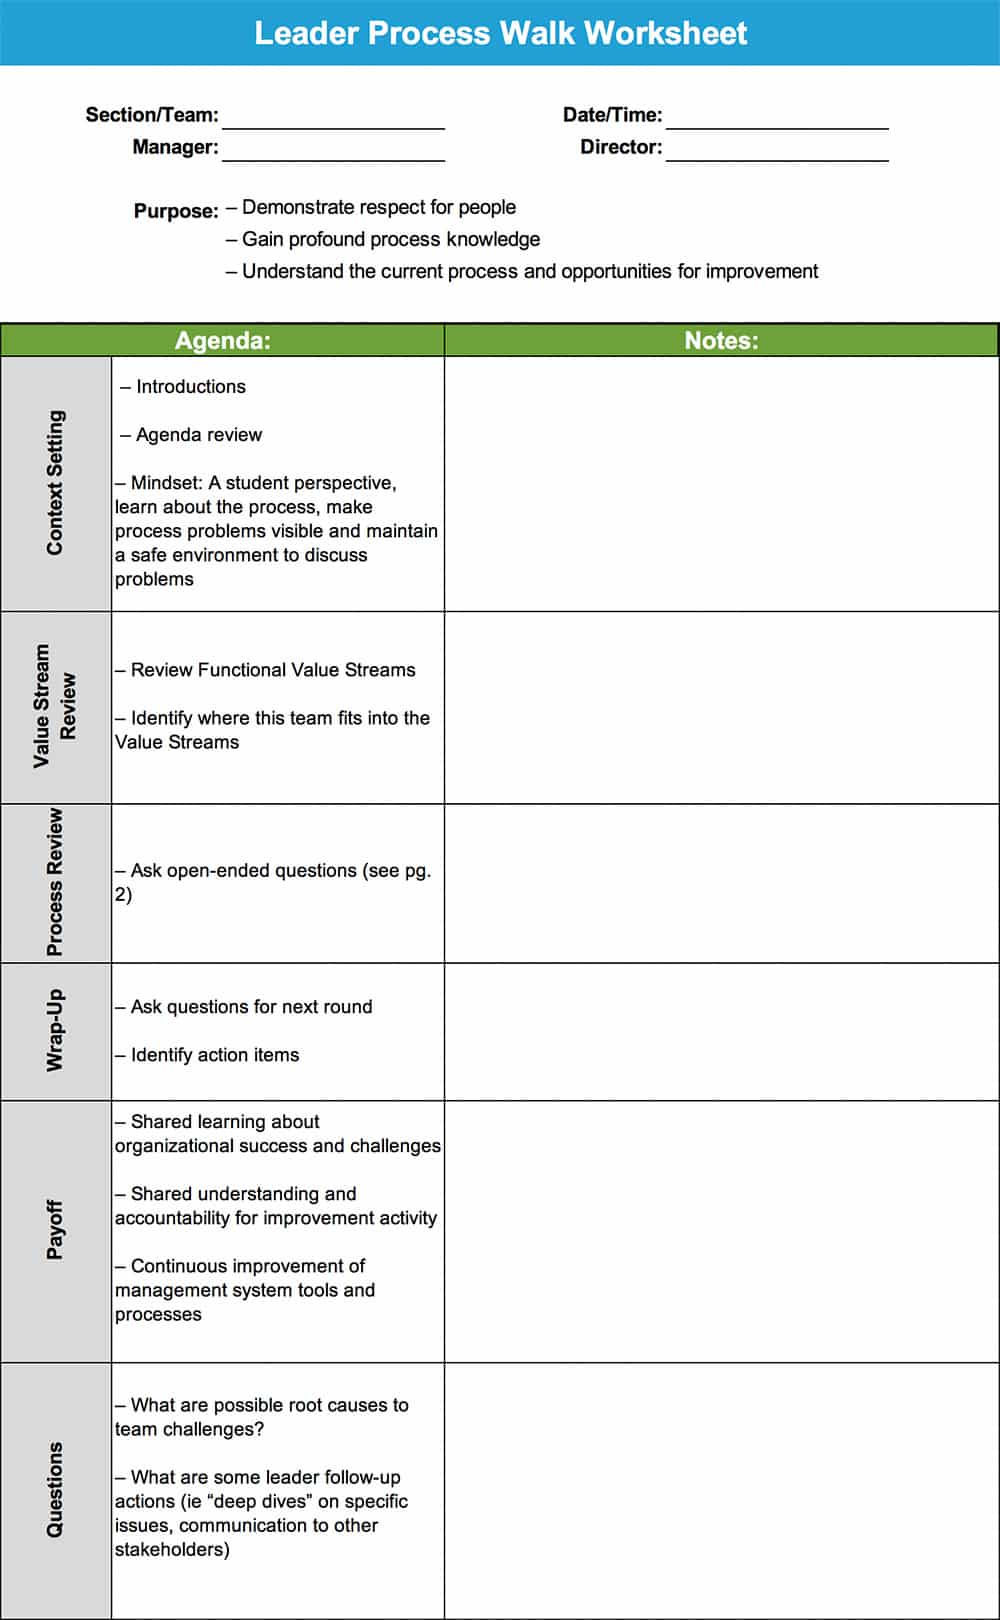 Leader Process Walk Worksheet - GoLeanSixSigma.com